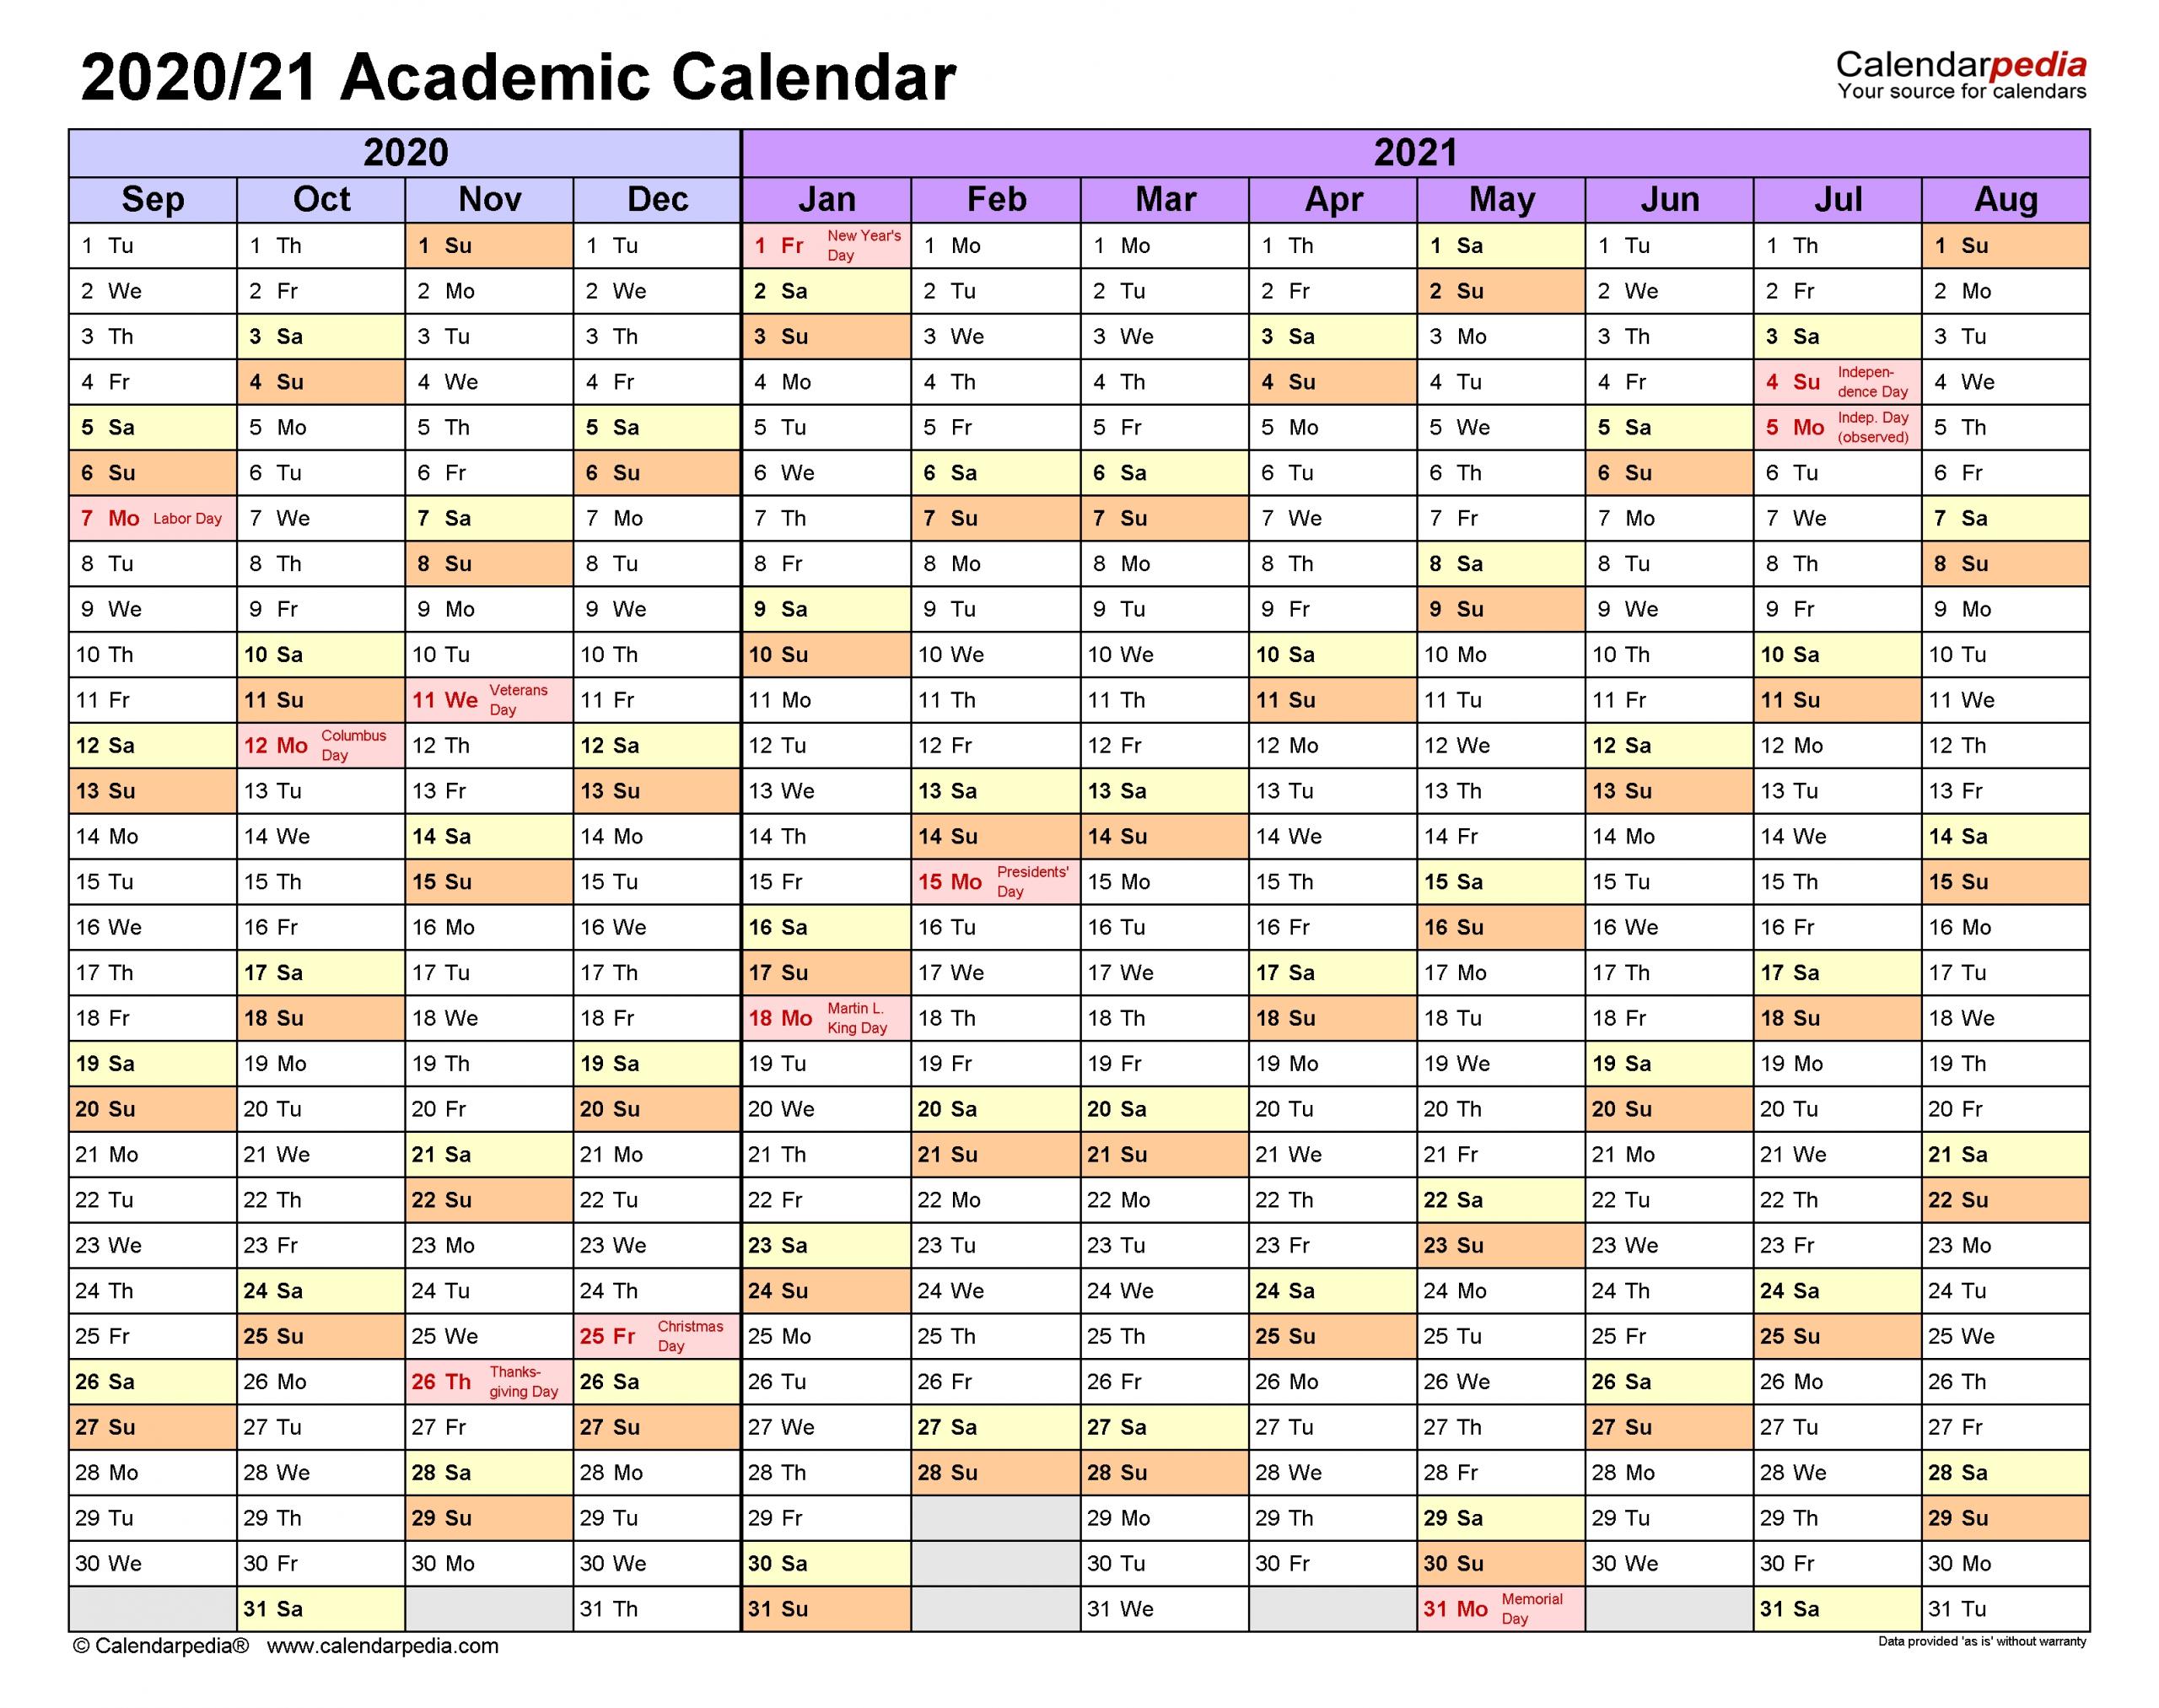 Academic Calendars 2020/2021 - Free Printable Excel Templates